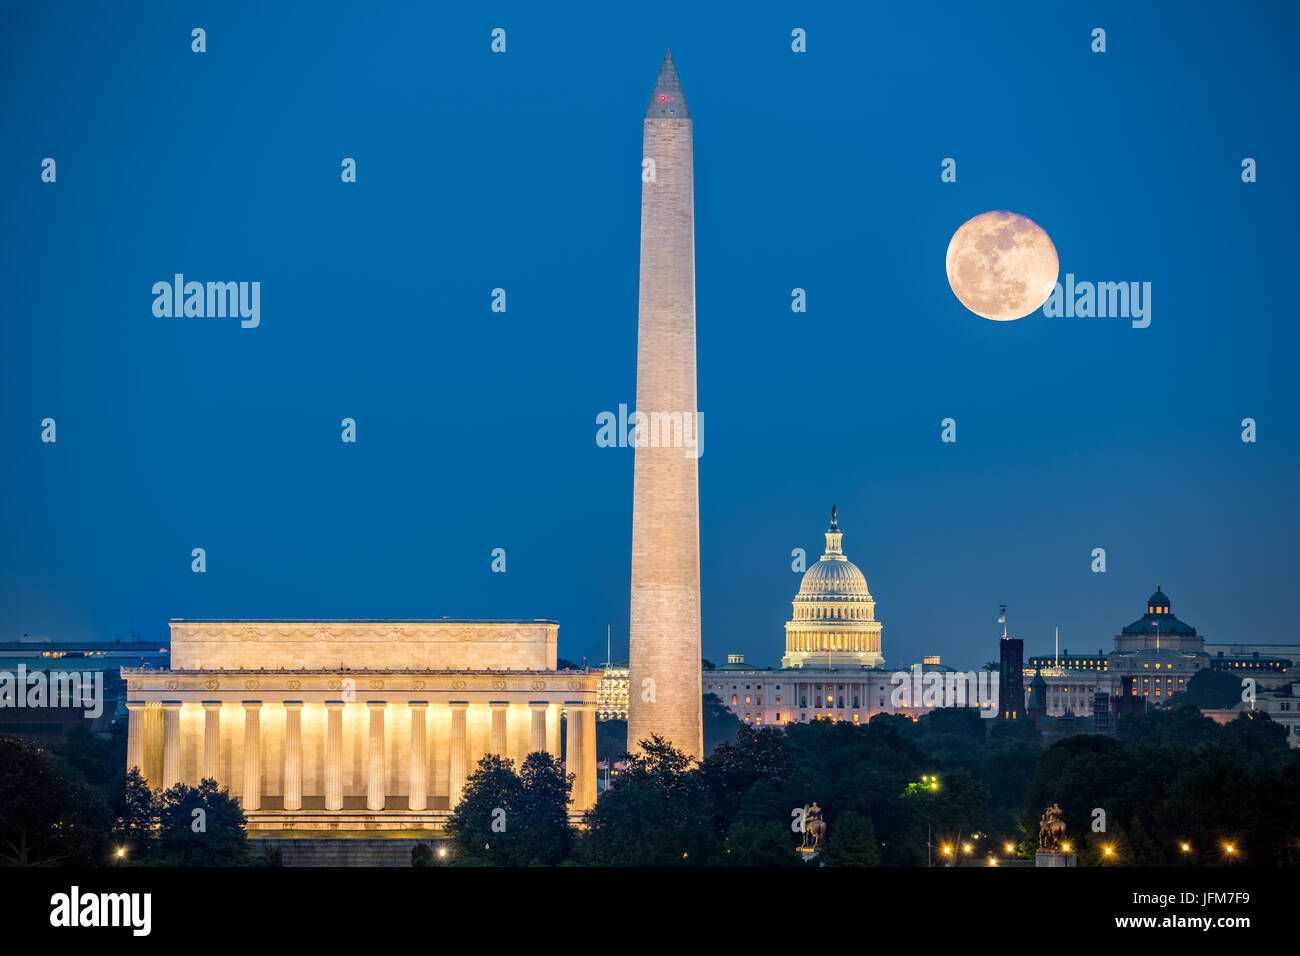 Supermoon über drei berühmte Denkmäler: Lincoln Memorial, Washington Monument und Kapitol in Washington, Stockbild